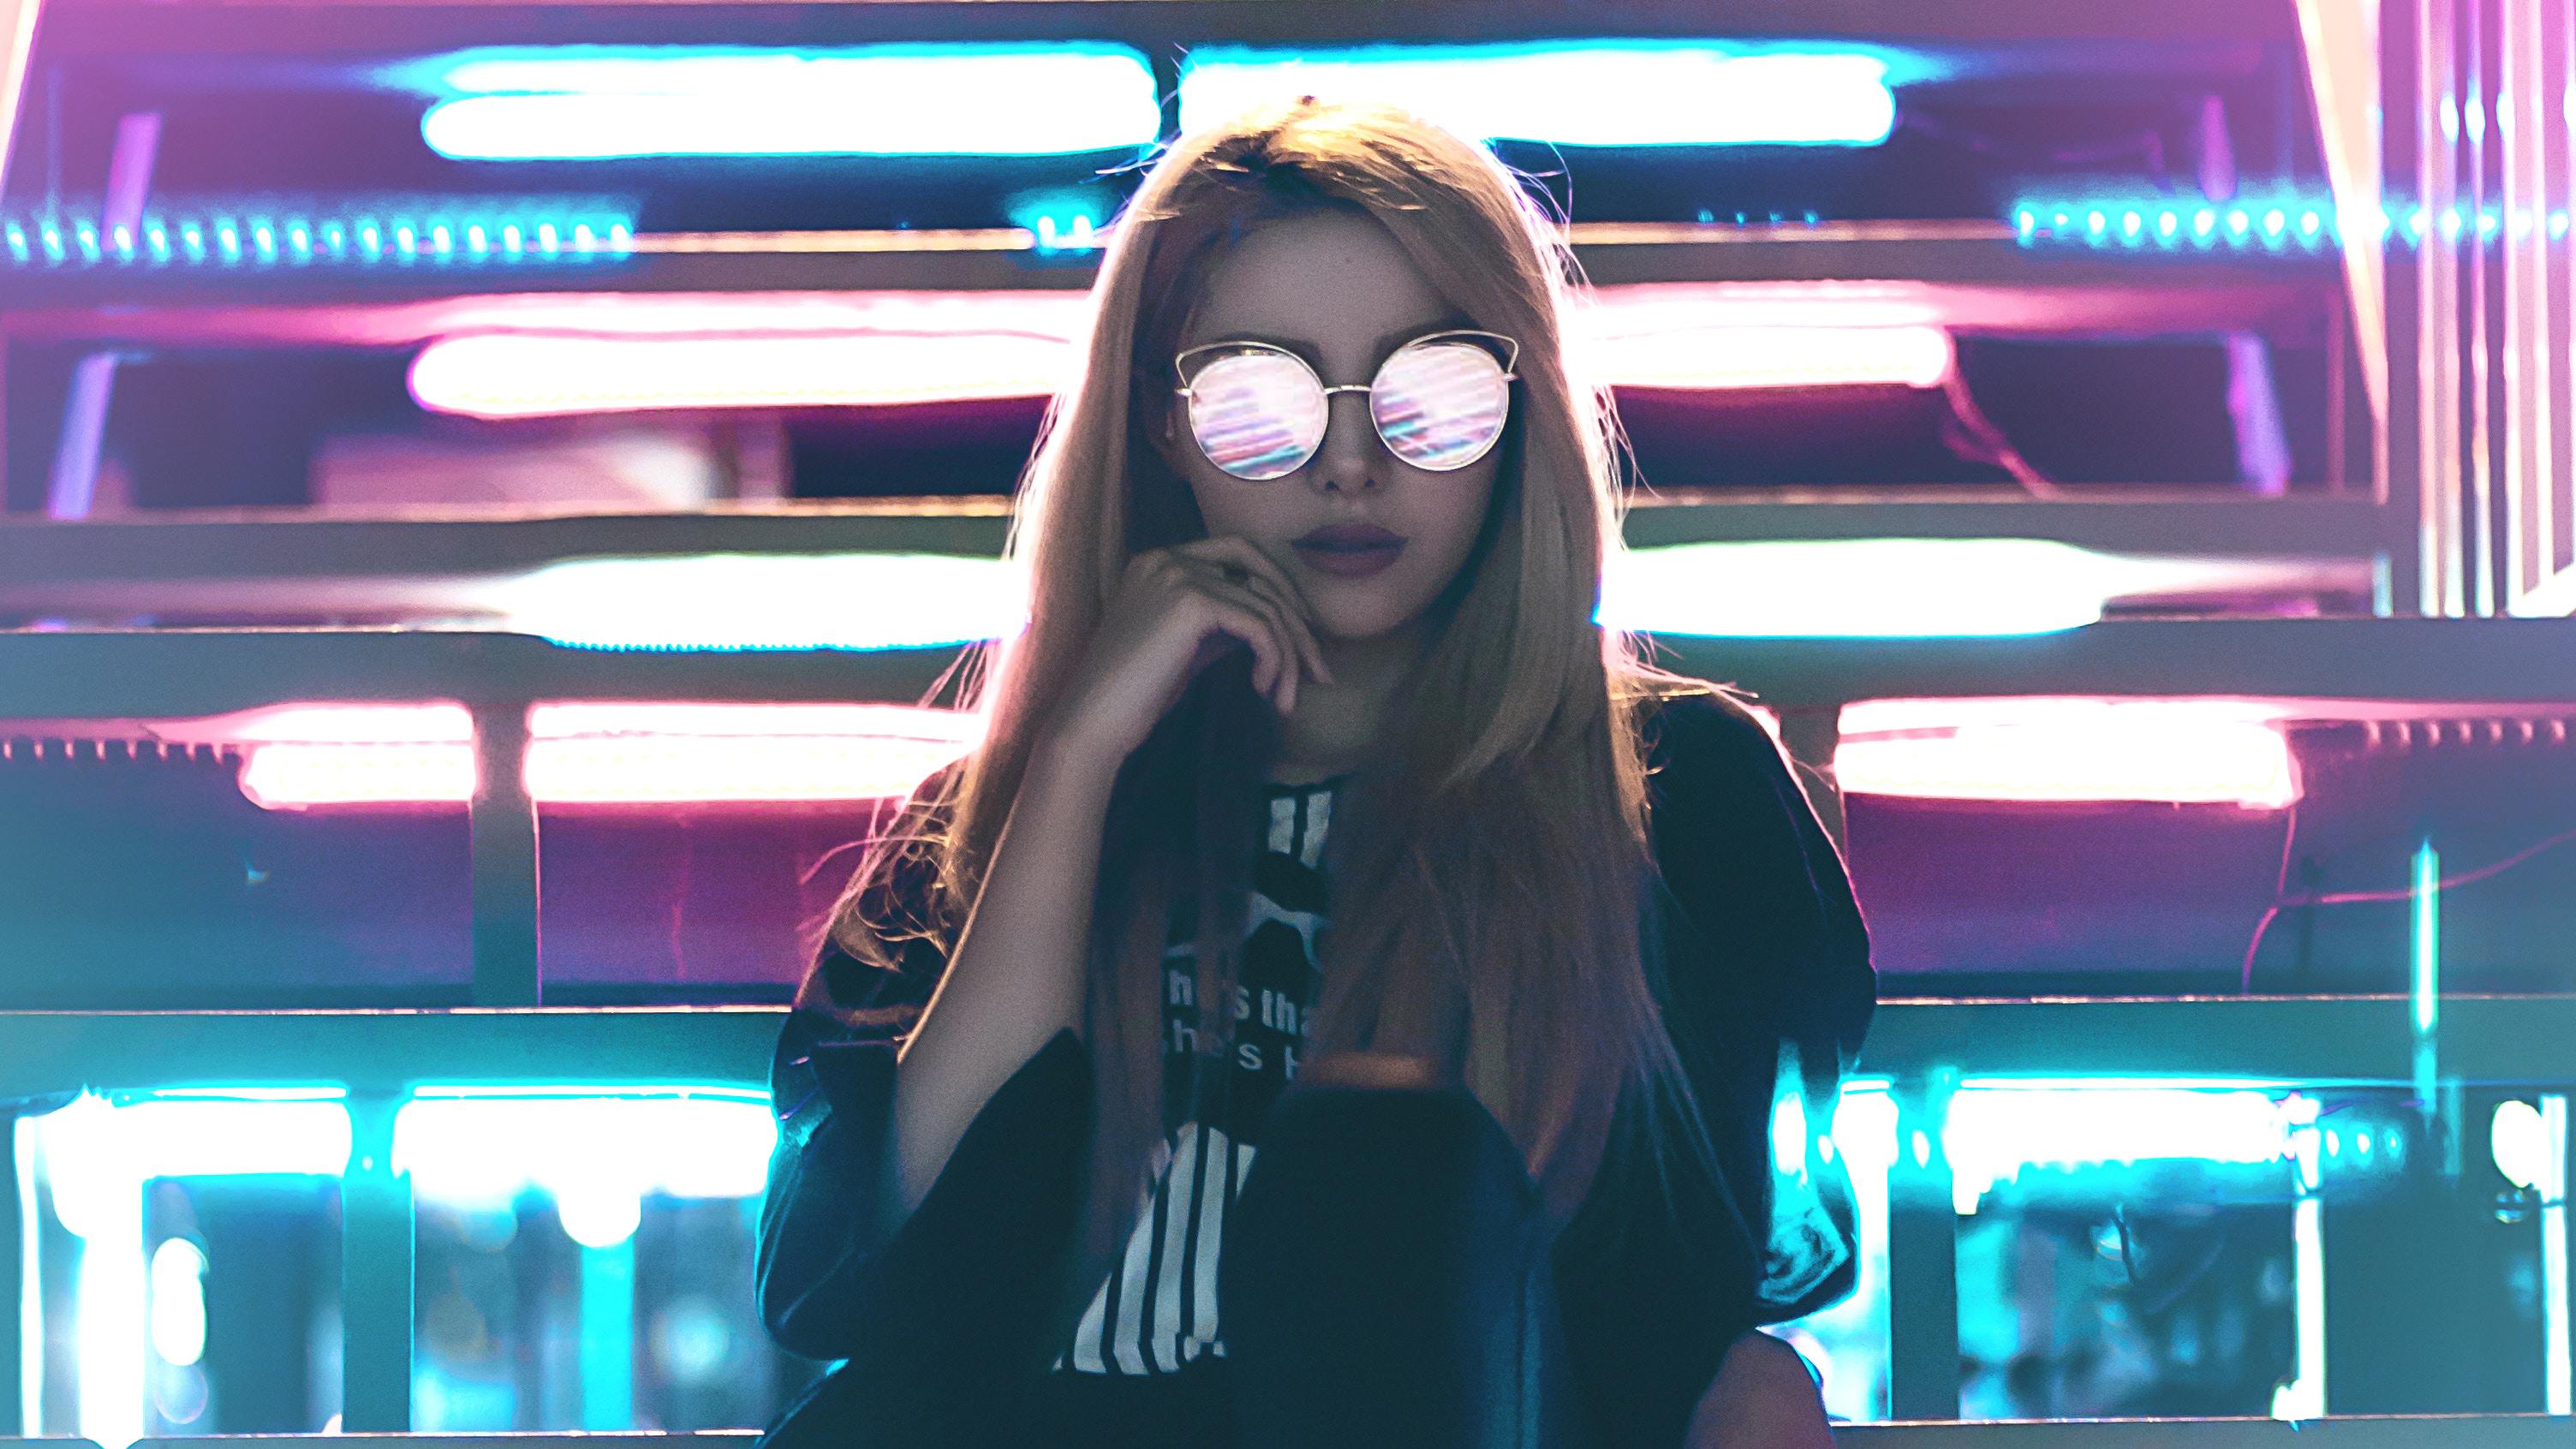 General 3008x1692 women blonde glasses neon night fantasy girl futuristic digital art modern Ali Pazani cyan purple